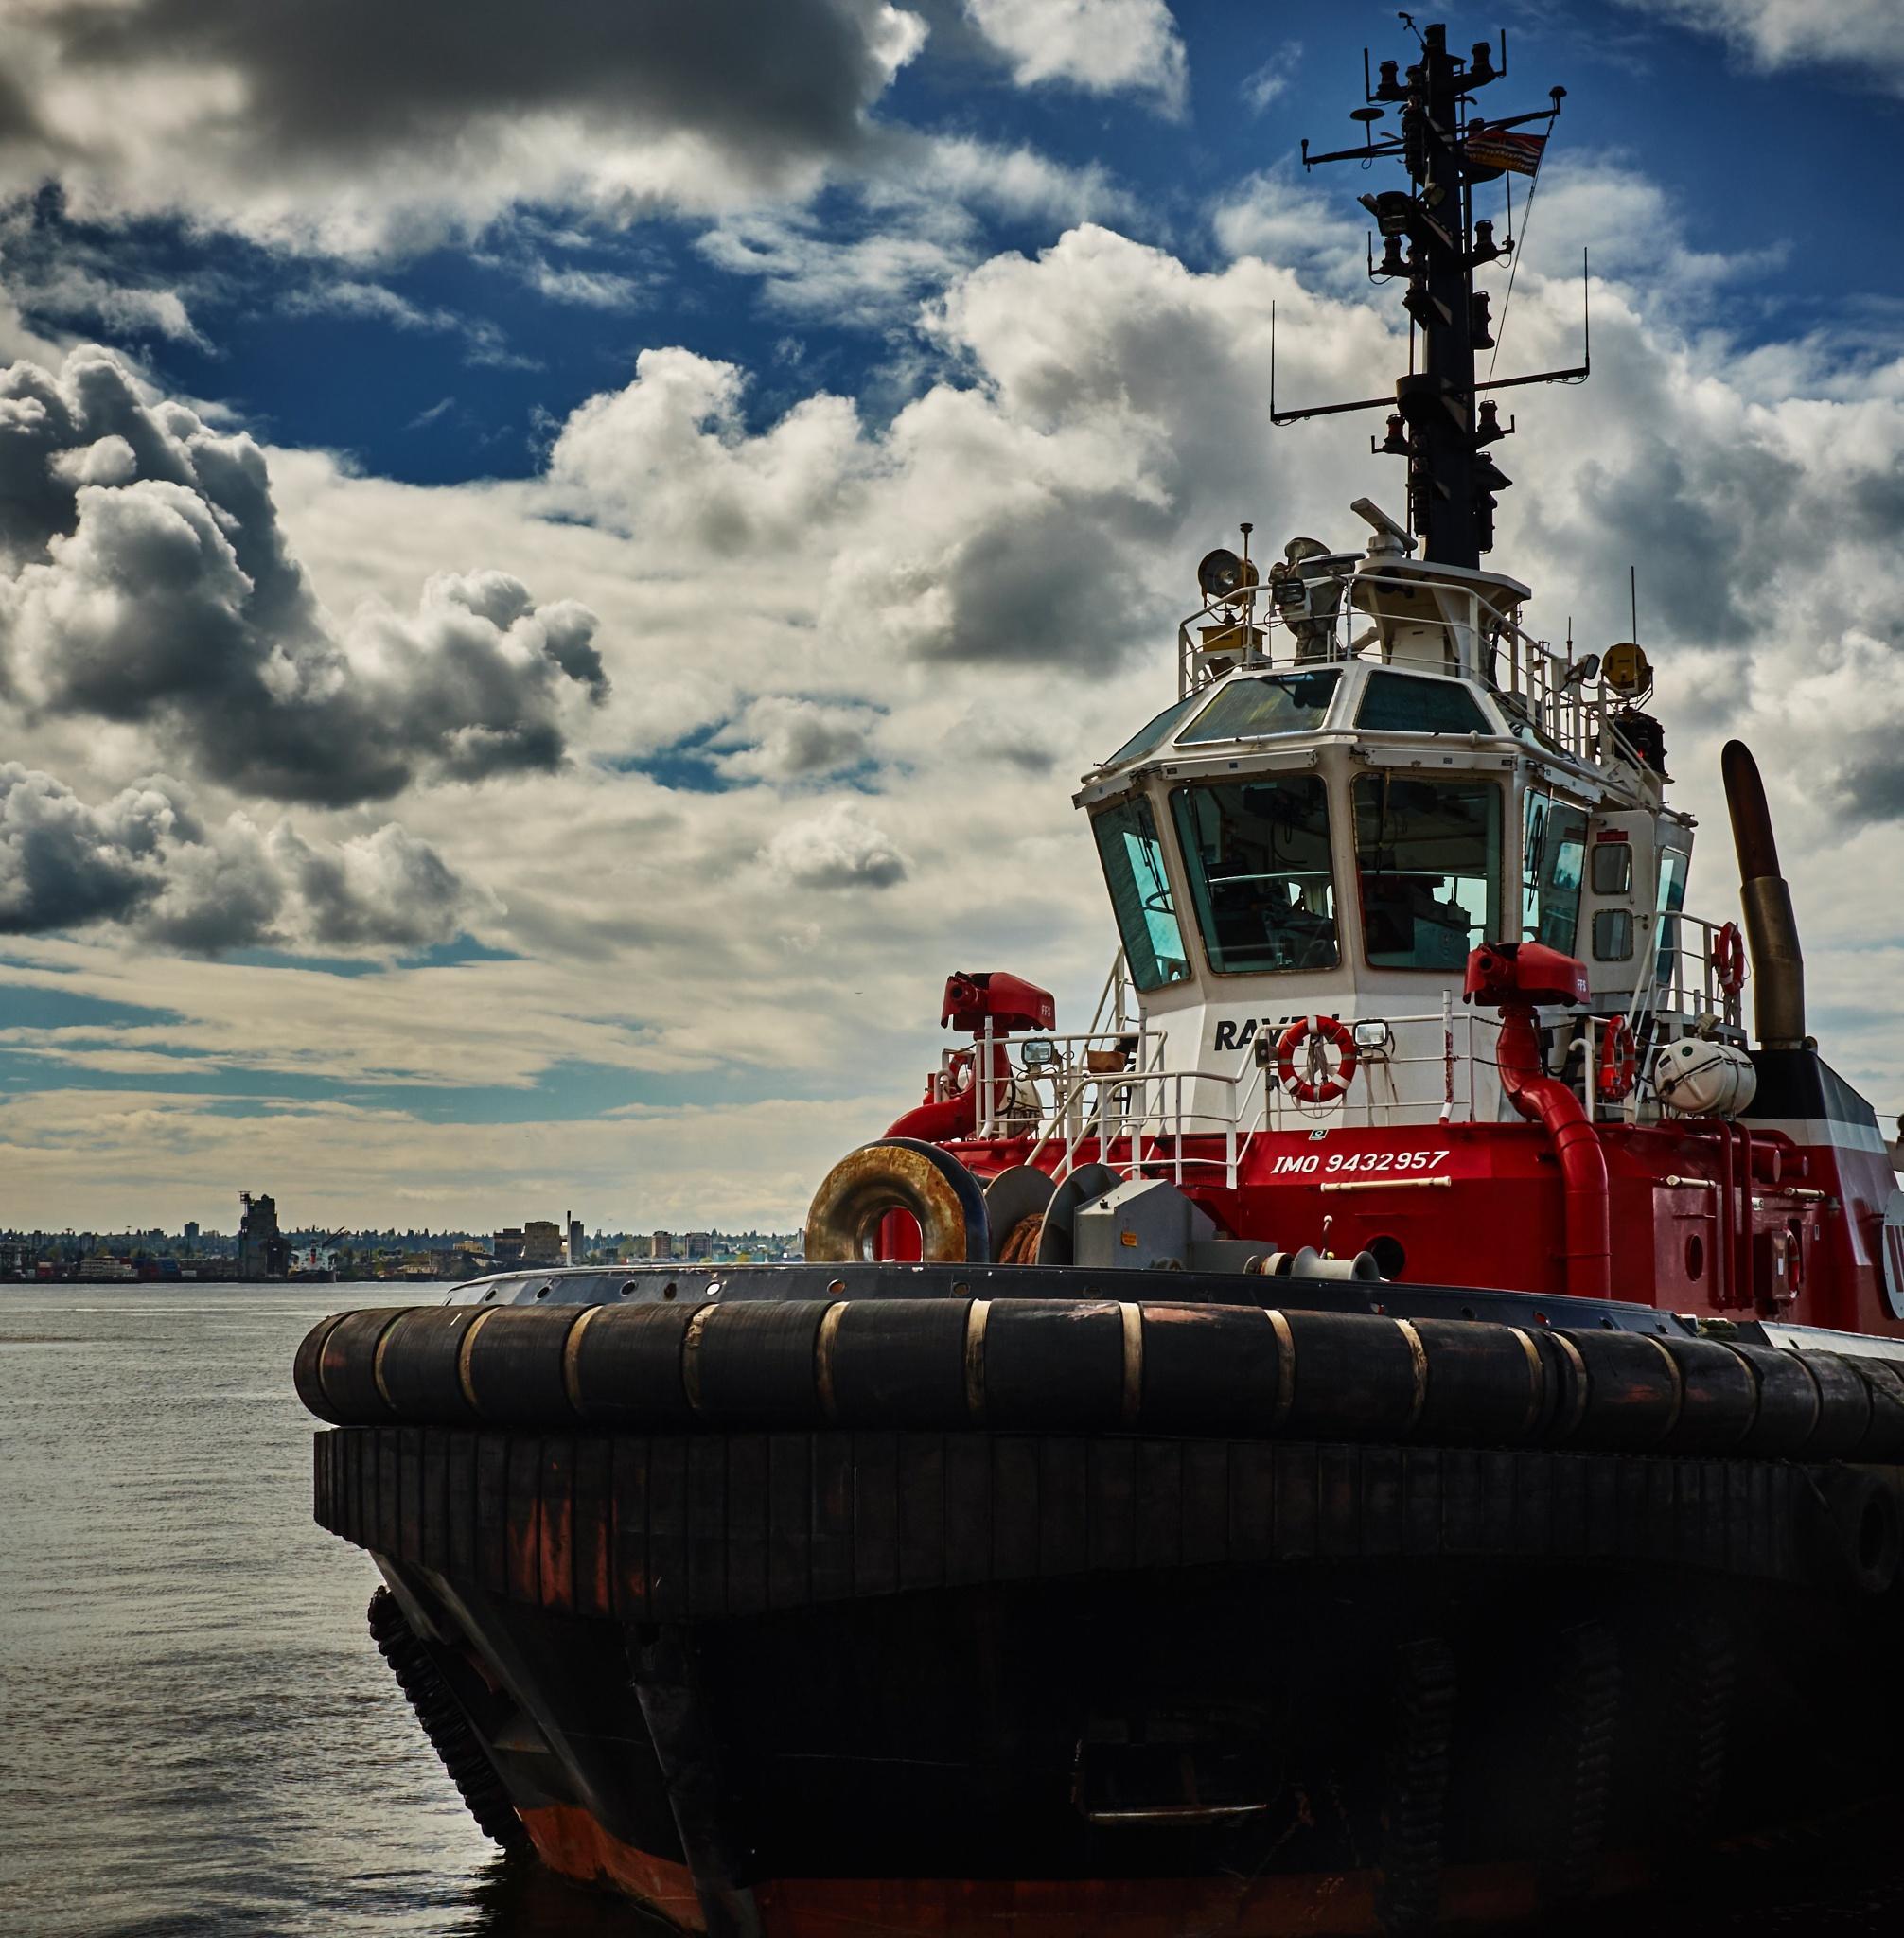 Tug boat by Greg Mullaly